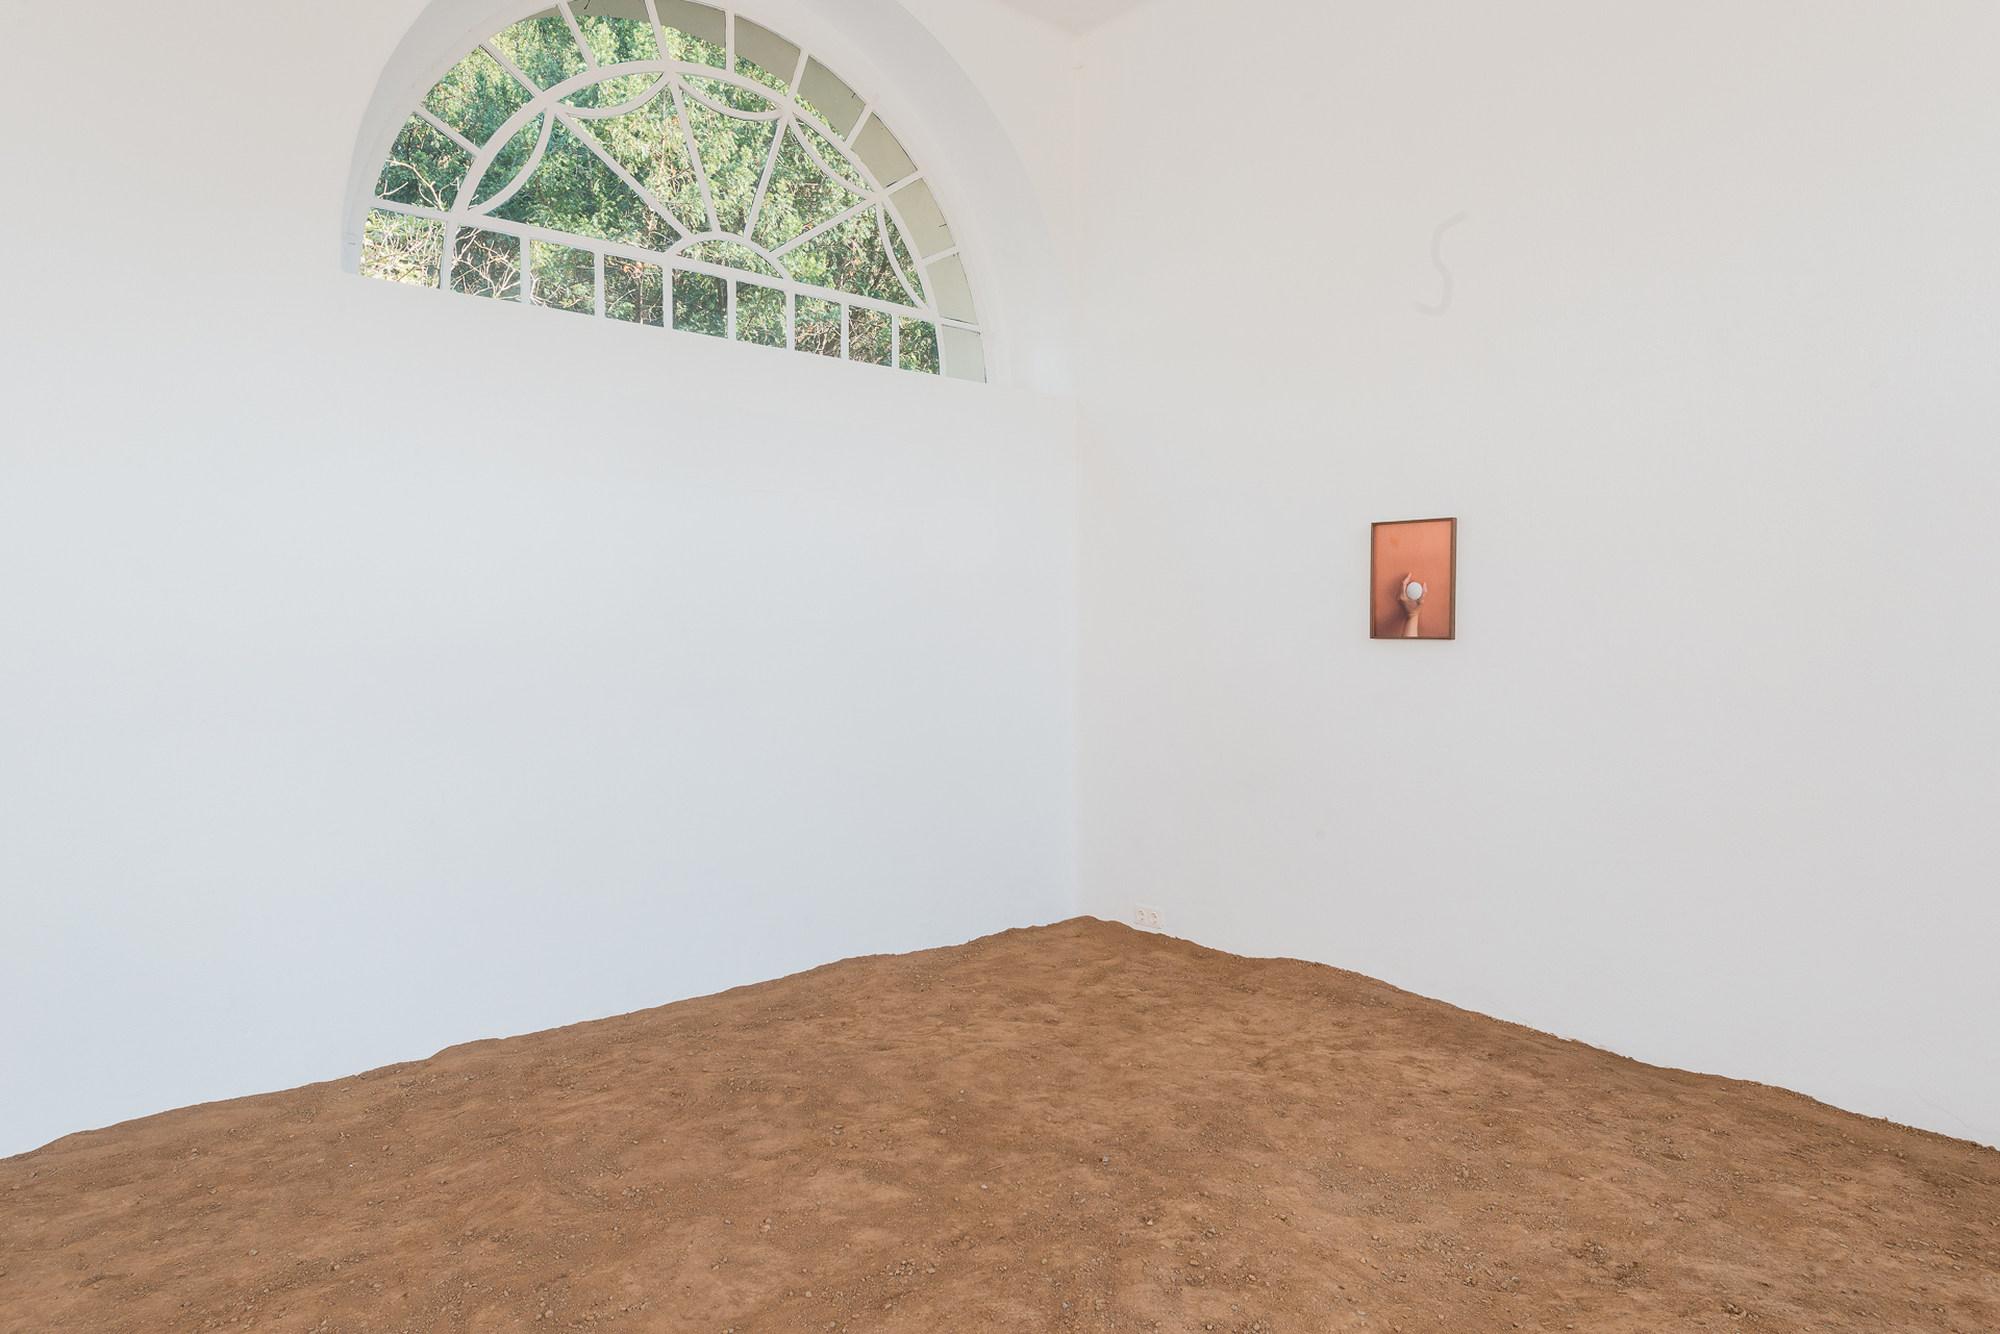 Anca Munteanu Rimnic at Kunstverein Braunschweig 6